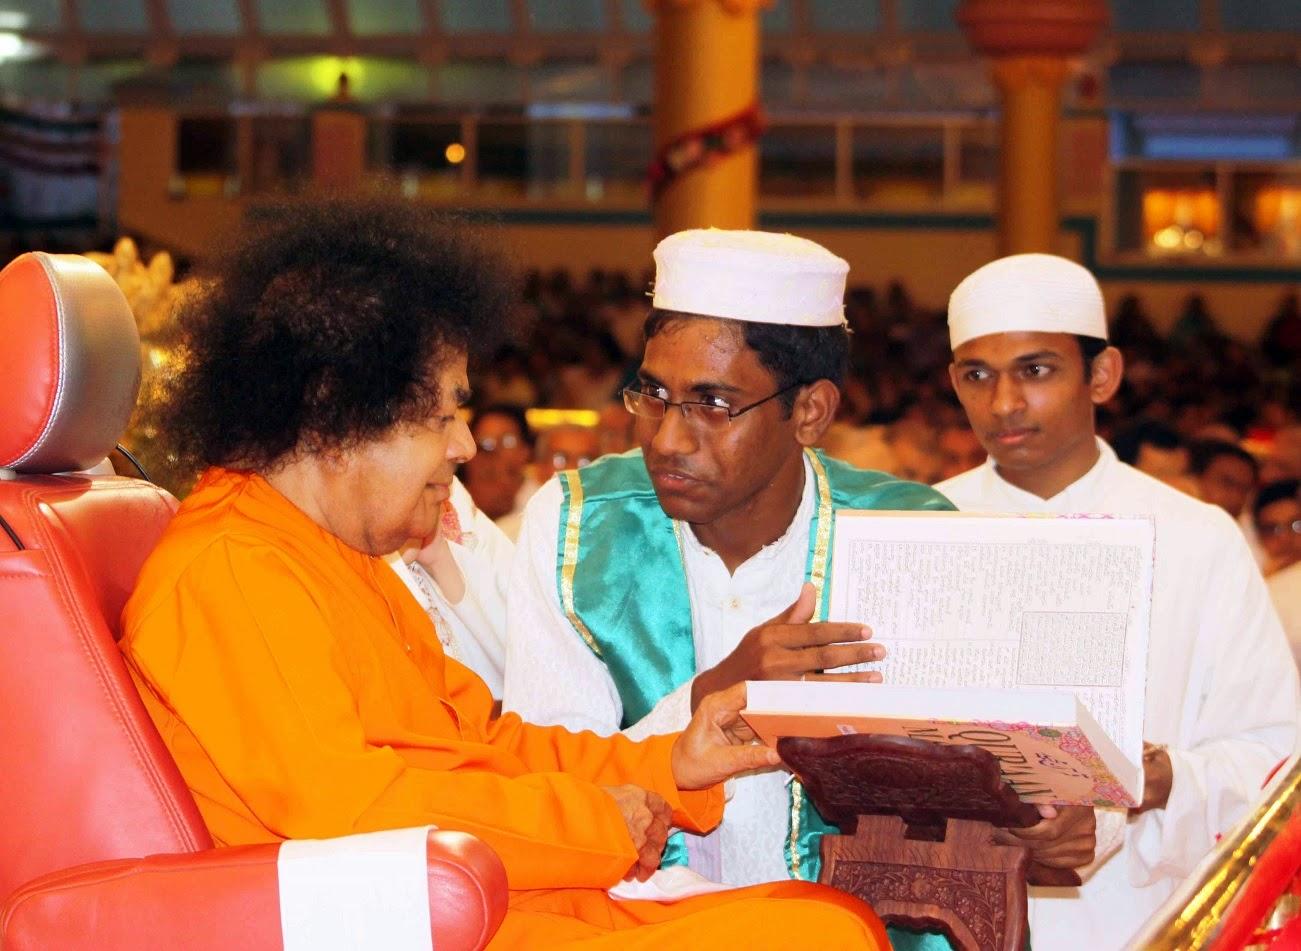 speech on guru pournima Guru vandana or गुरु मन्त्र (guru mantra) are sanskrit stanzas addressed to teacher or गुरु (guru) these shlokas praise the गुरु (guru) for his god like qualities.